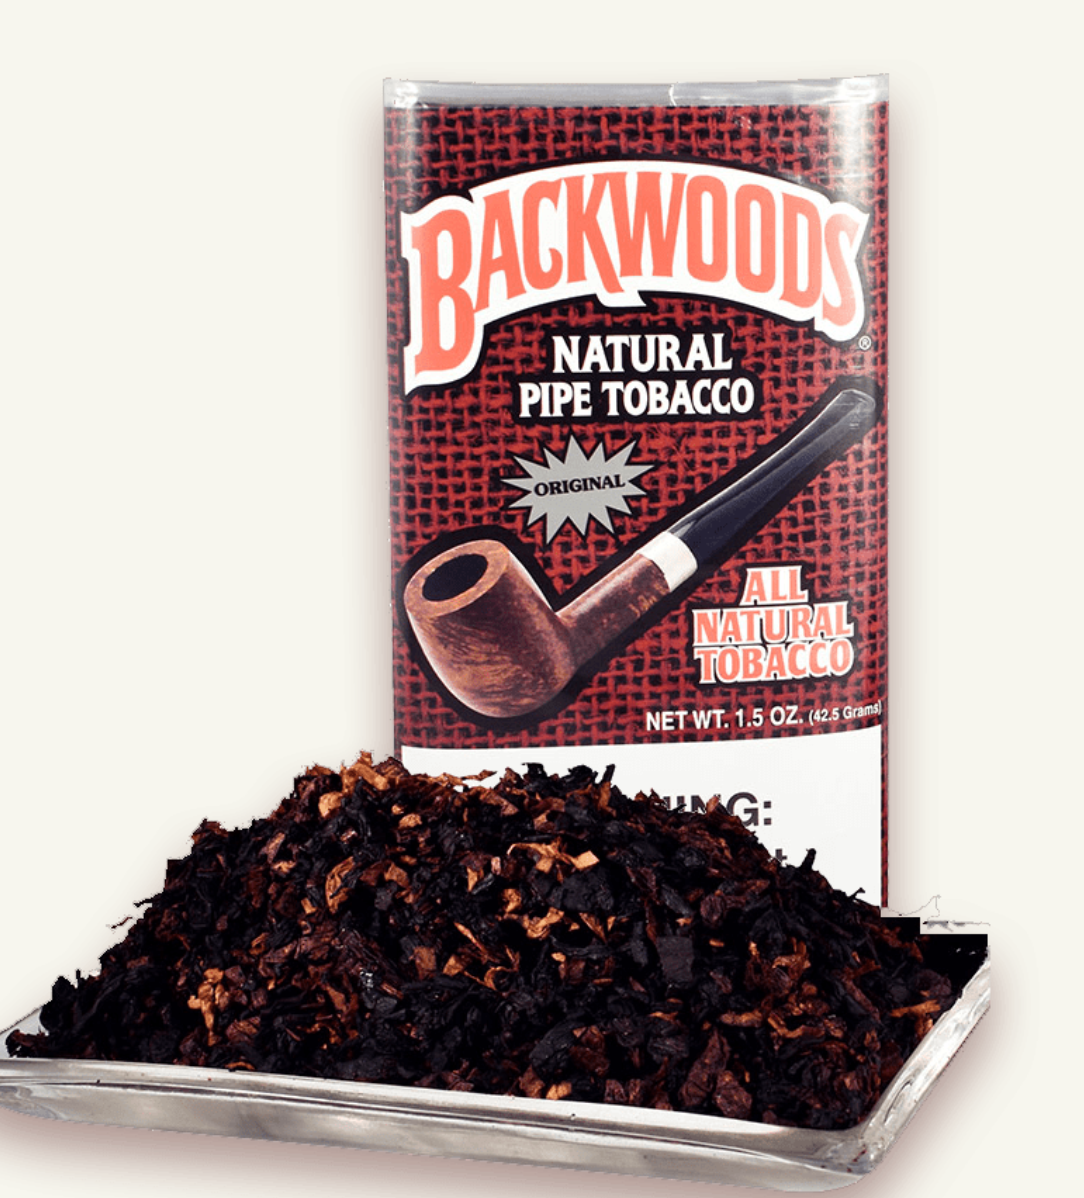 Sutliff Backwoods Original Pipe Tobacco 1.5 oz Pack